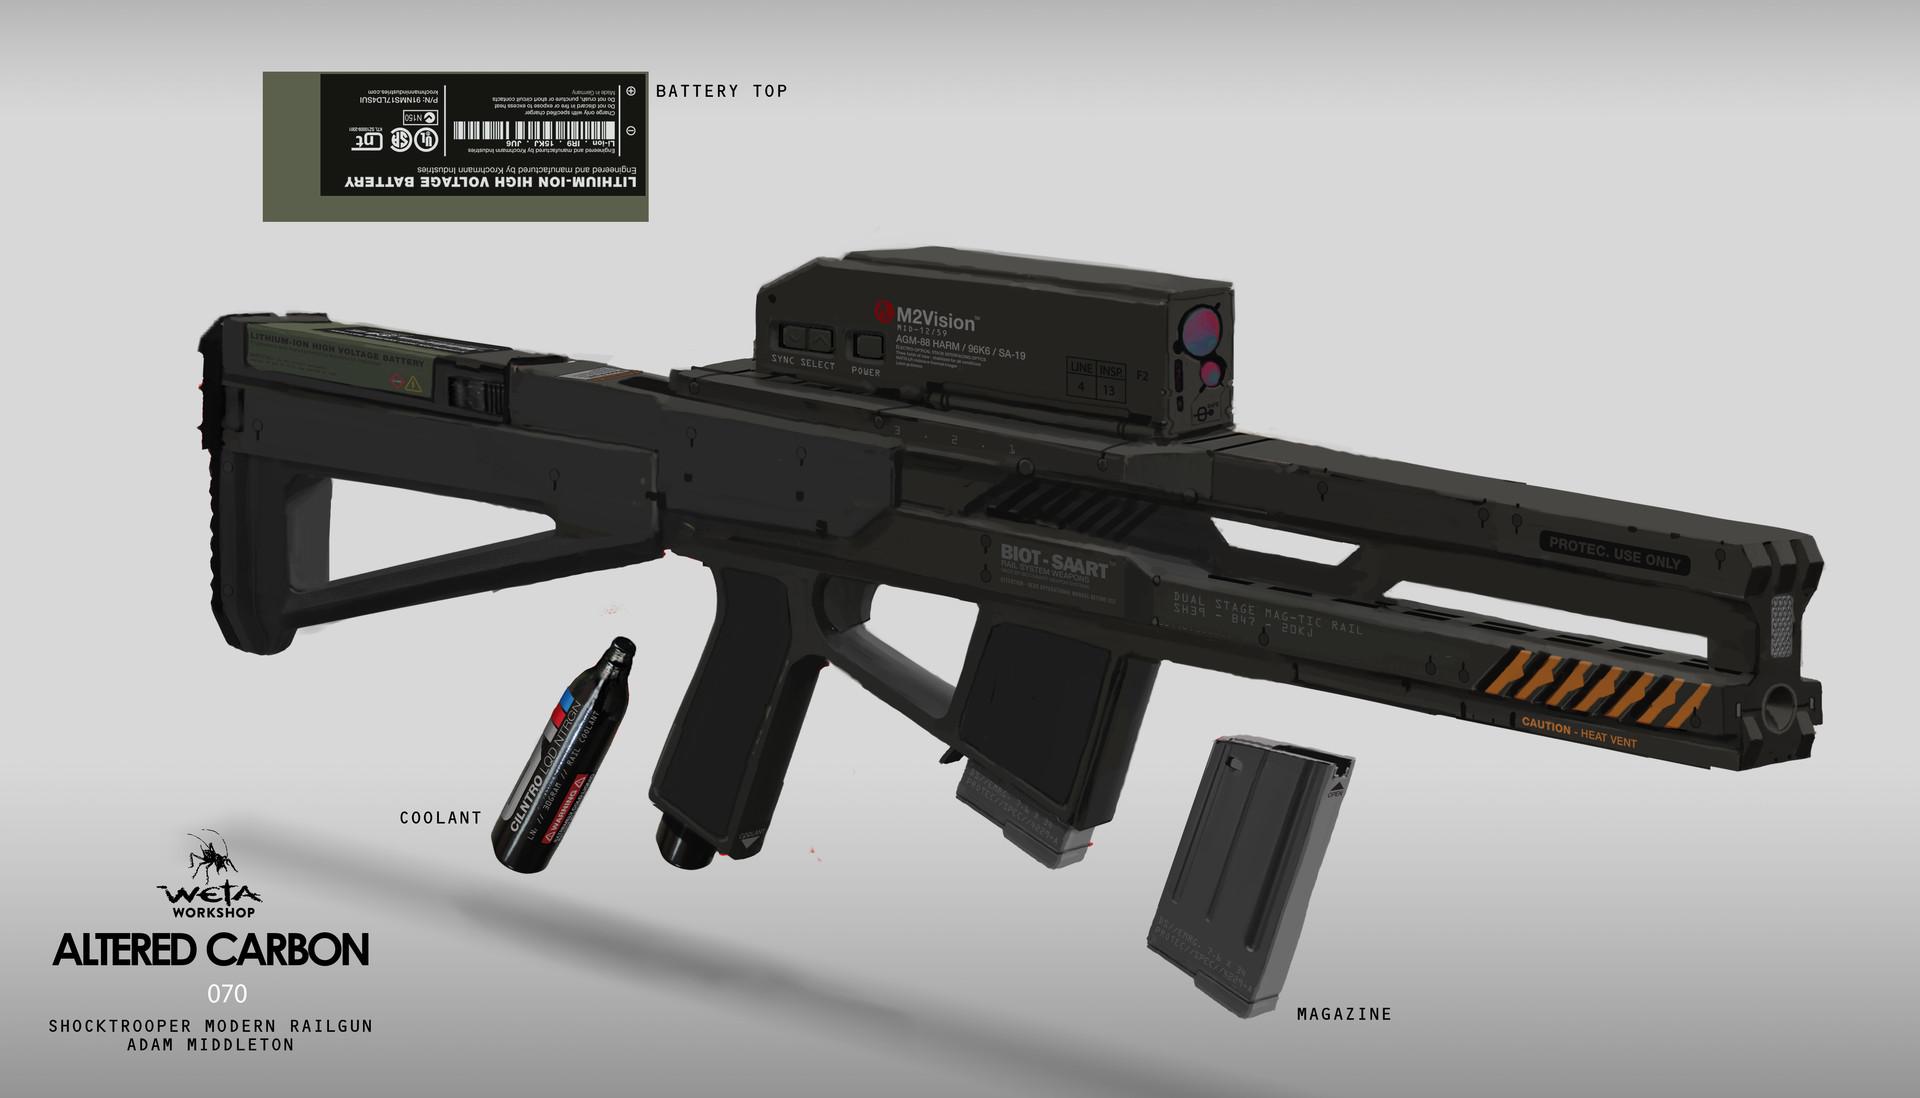 Adam middleton 070 ac shocktrooter railgun graphics pass 01 am